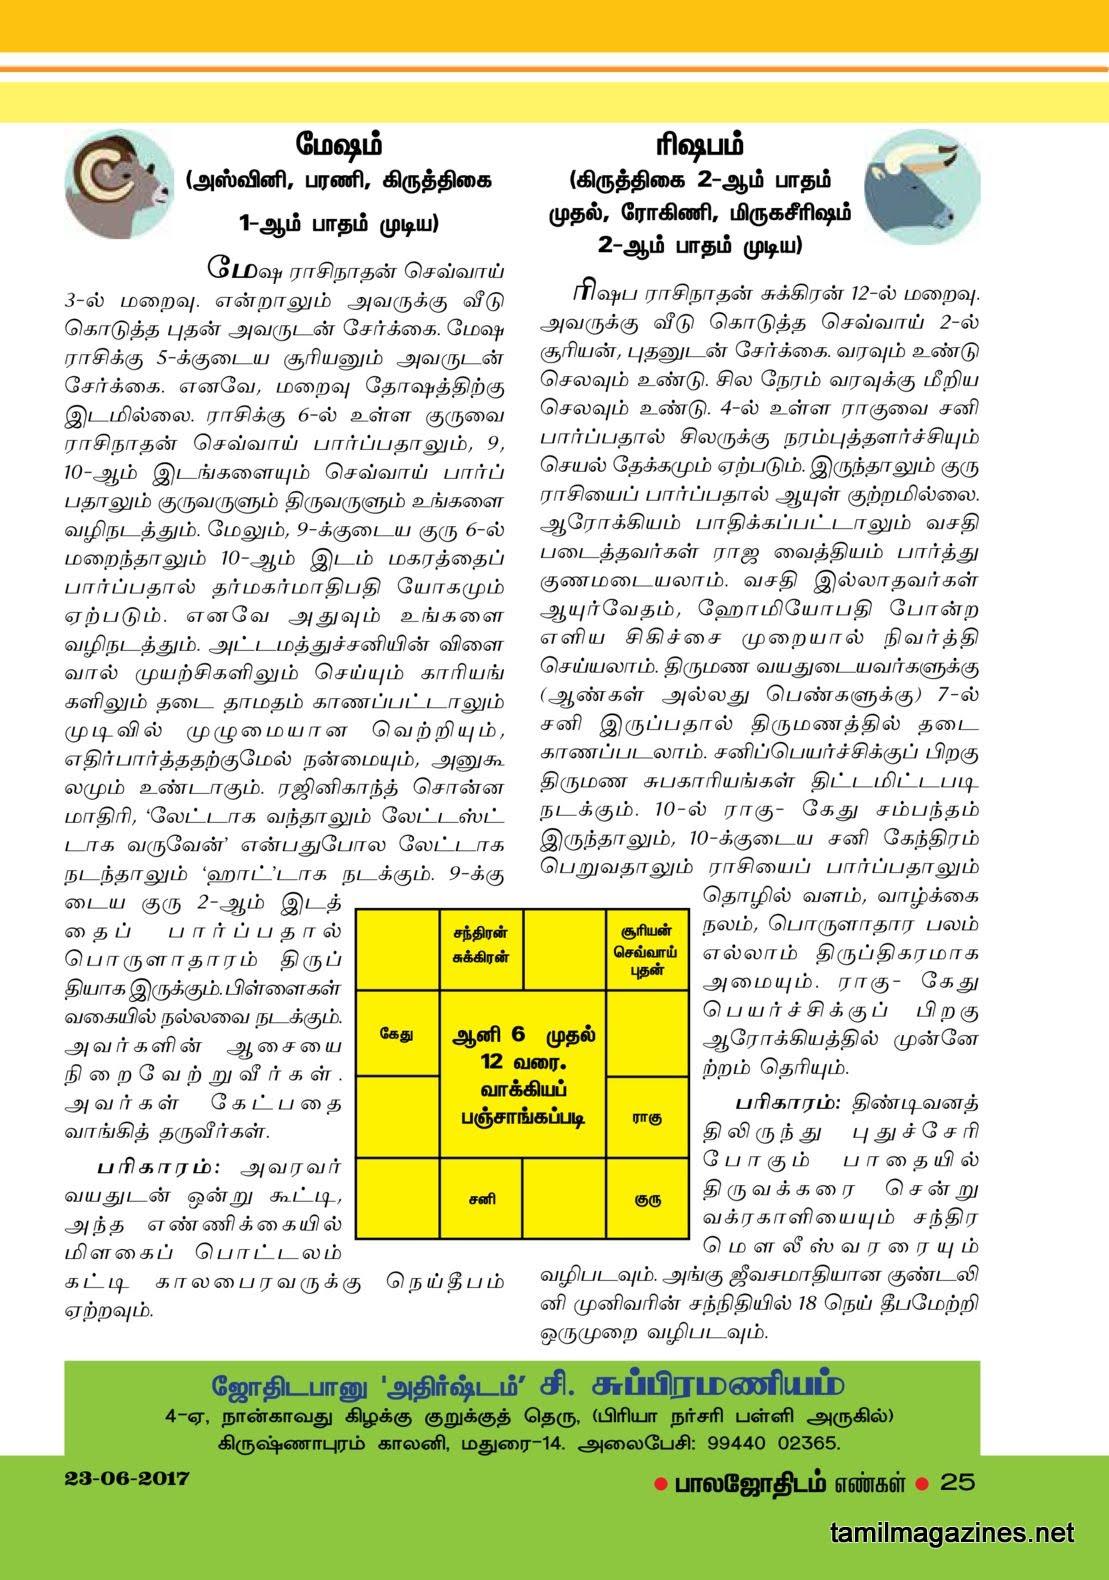 Balajothidam Raasi Palan June 20-26, 2017